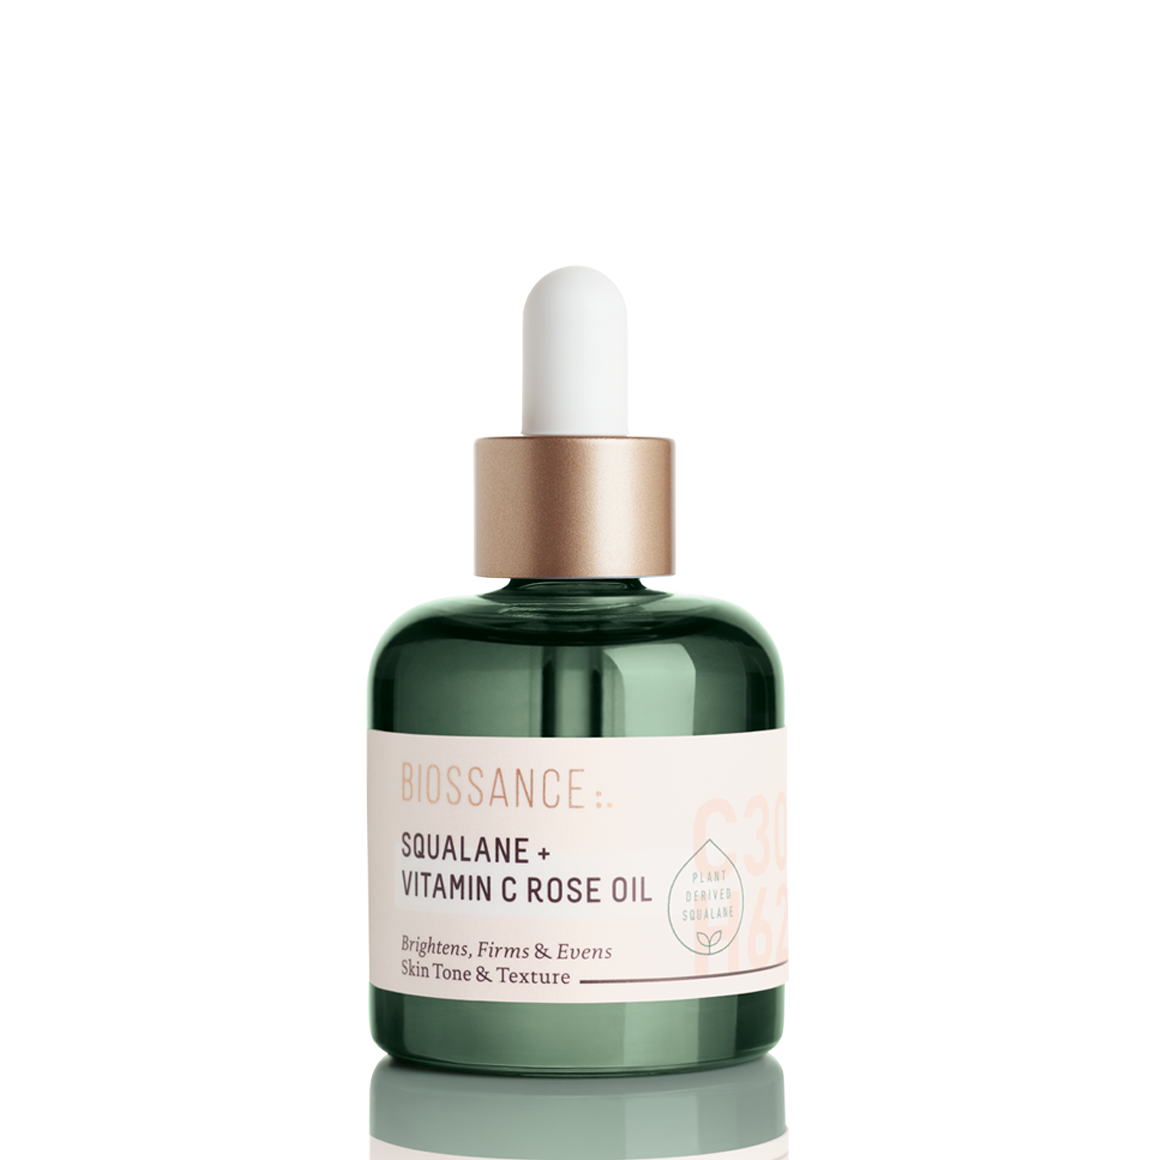 Squalane-_-Vitamin-C-Rose-Oil_Full_white-1160-x-1160_580x@2x.png